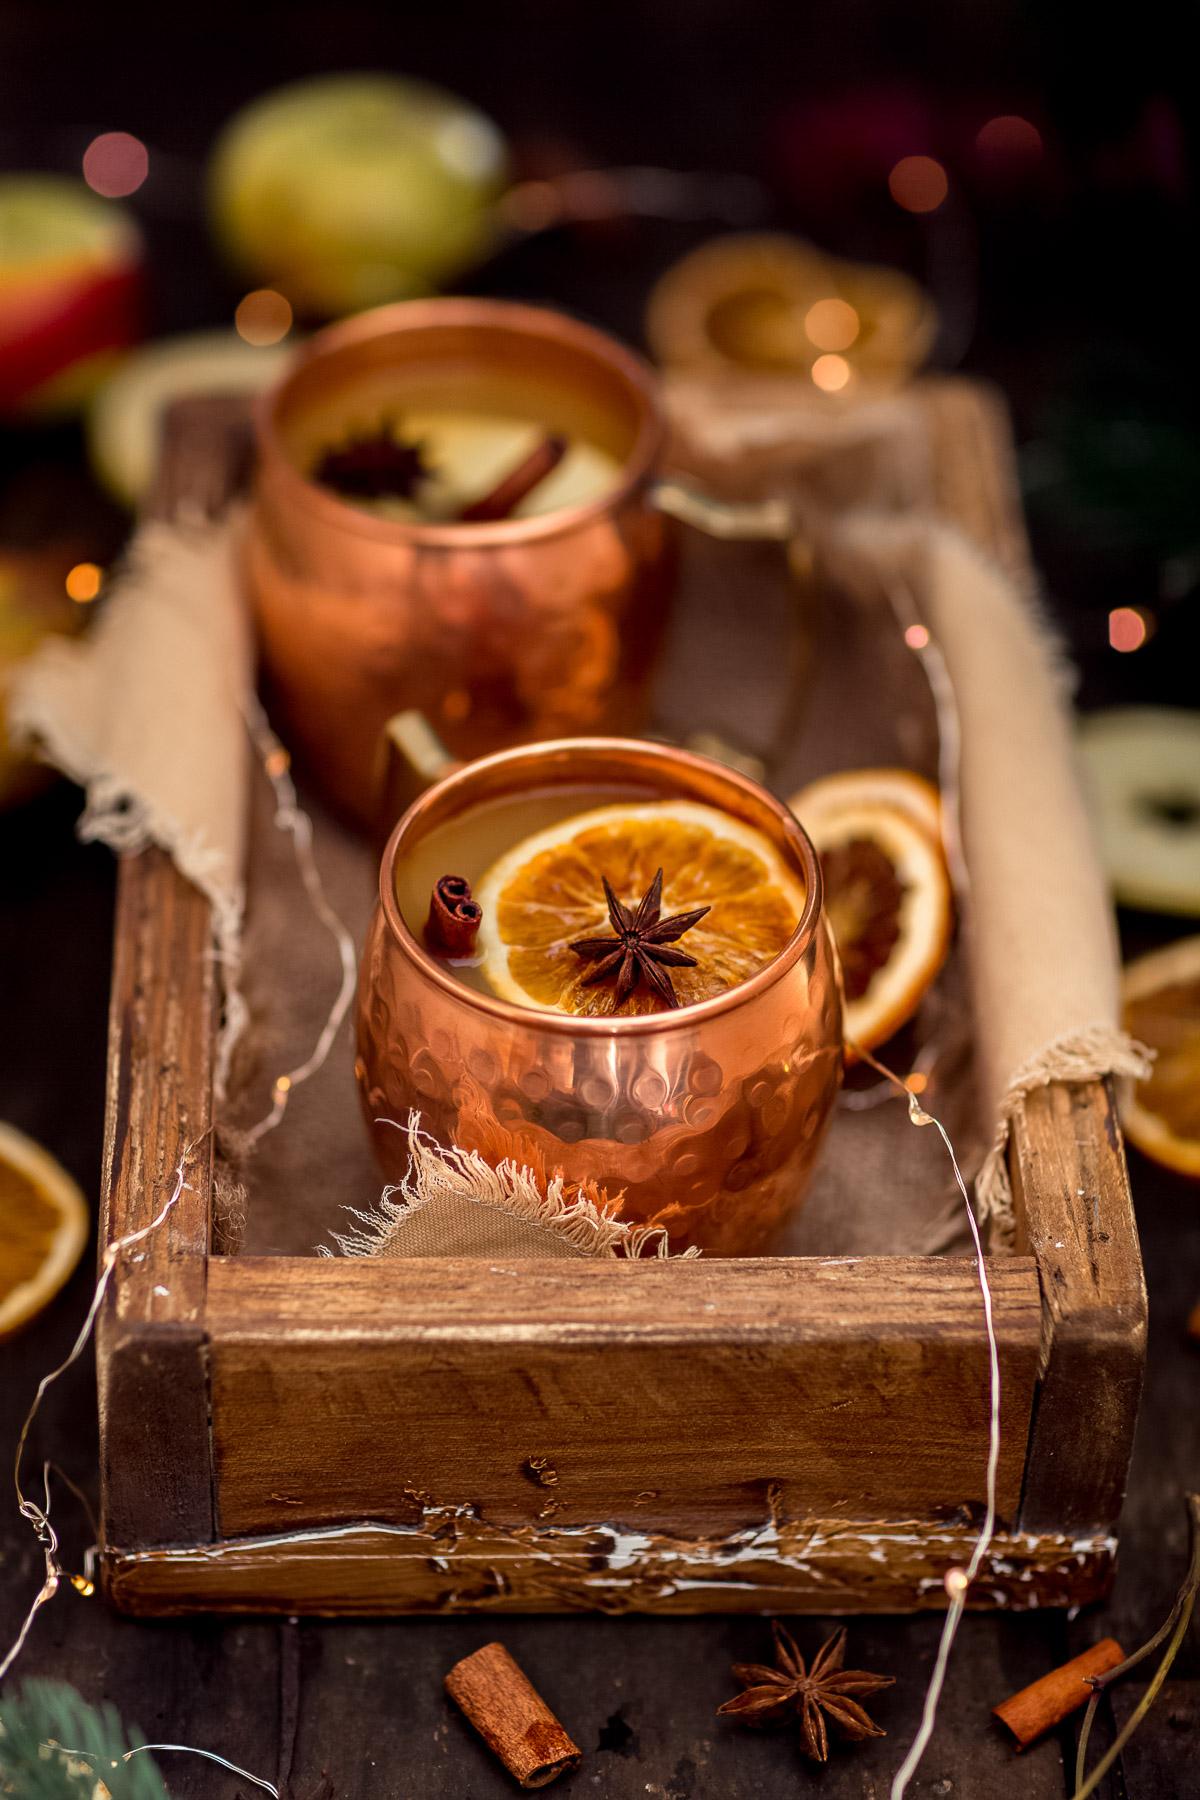 Healthy sugar-free APPLE MULLED WINE recipe #vegan ricetta Brulè di mele fatto in casa senza zucchero come ai Mercatini di Natale Apfelglühwein